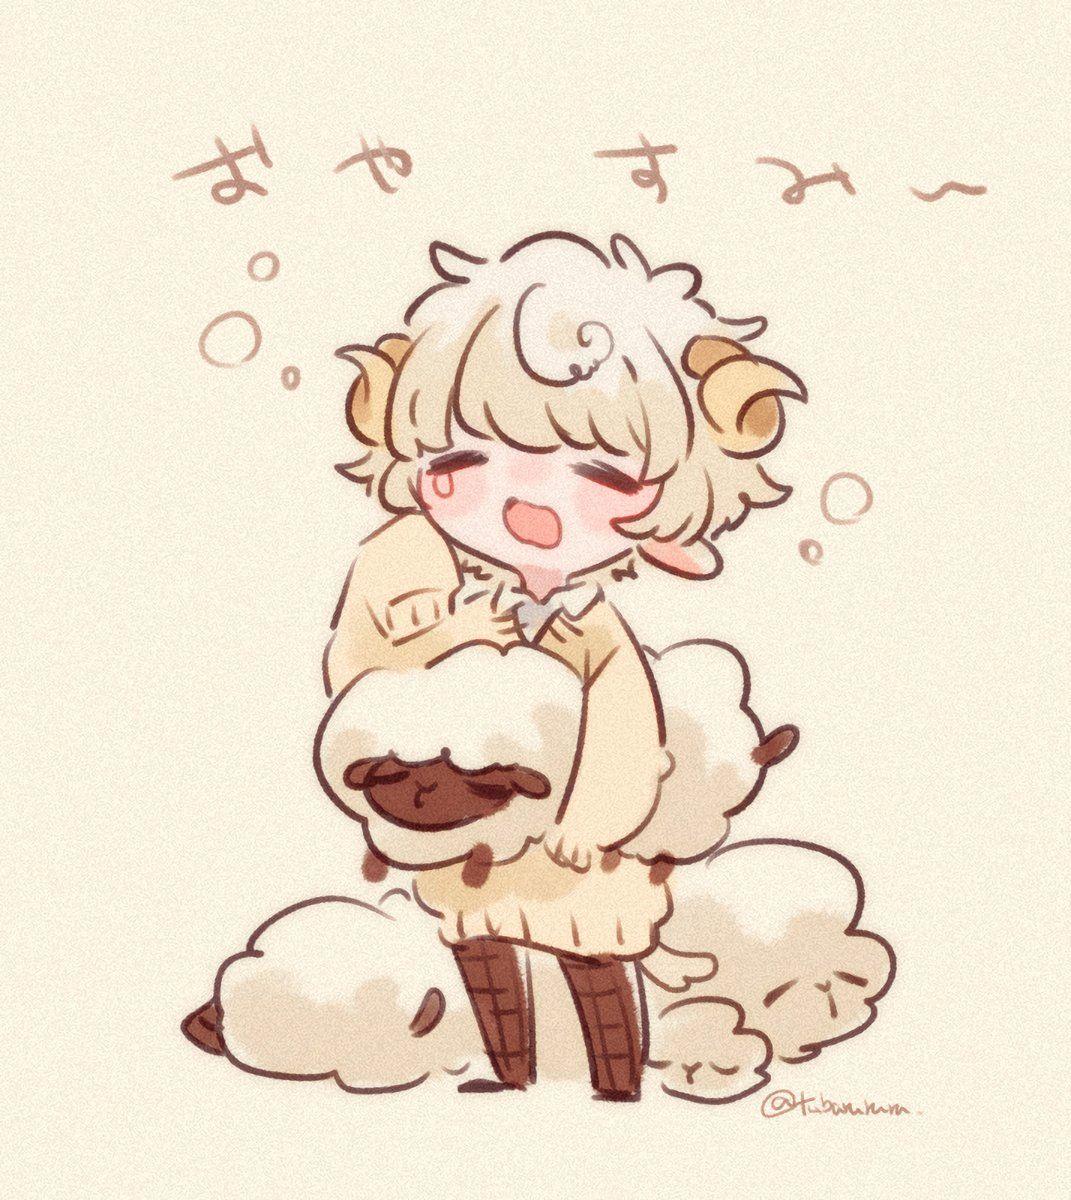 Pin de mafuru en khác | Pinterest | Ilustración manga, Dibujos ...